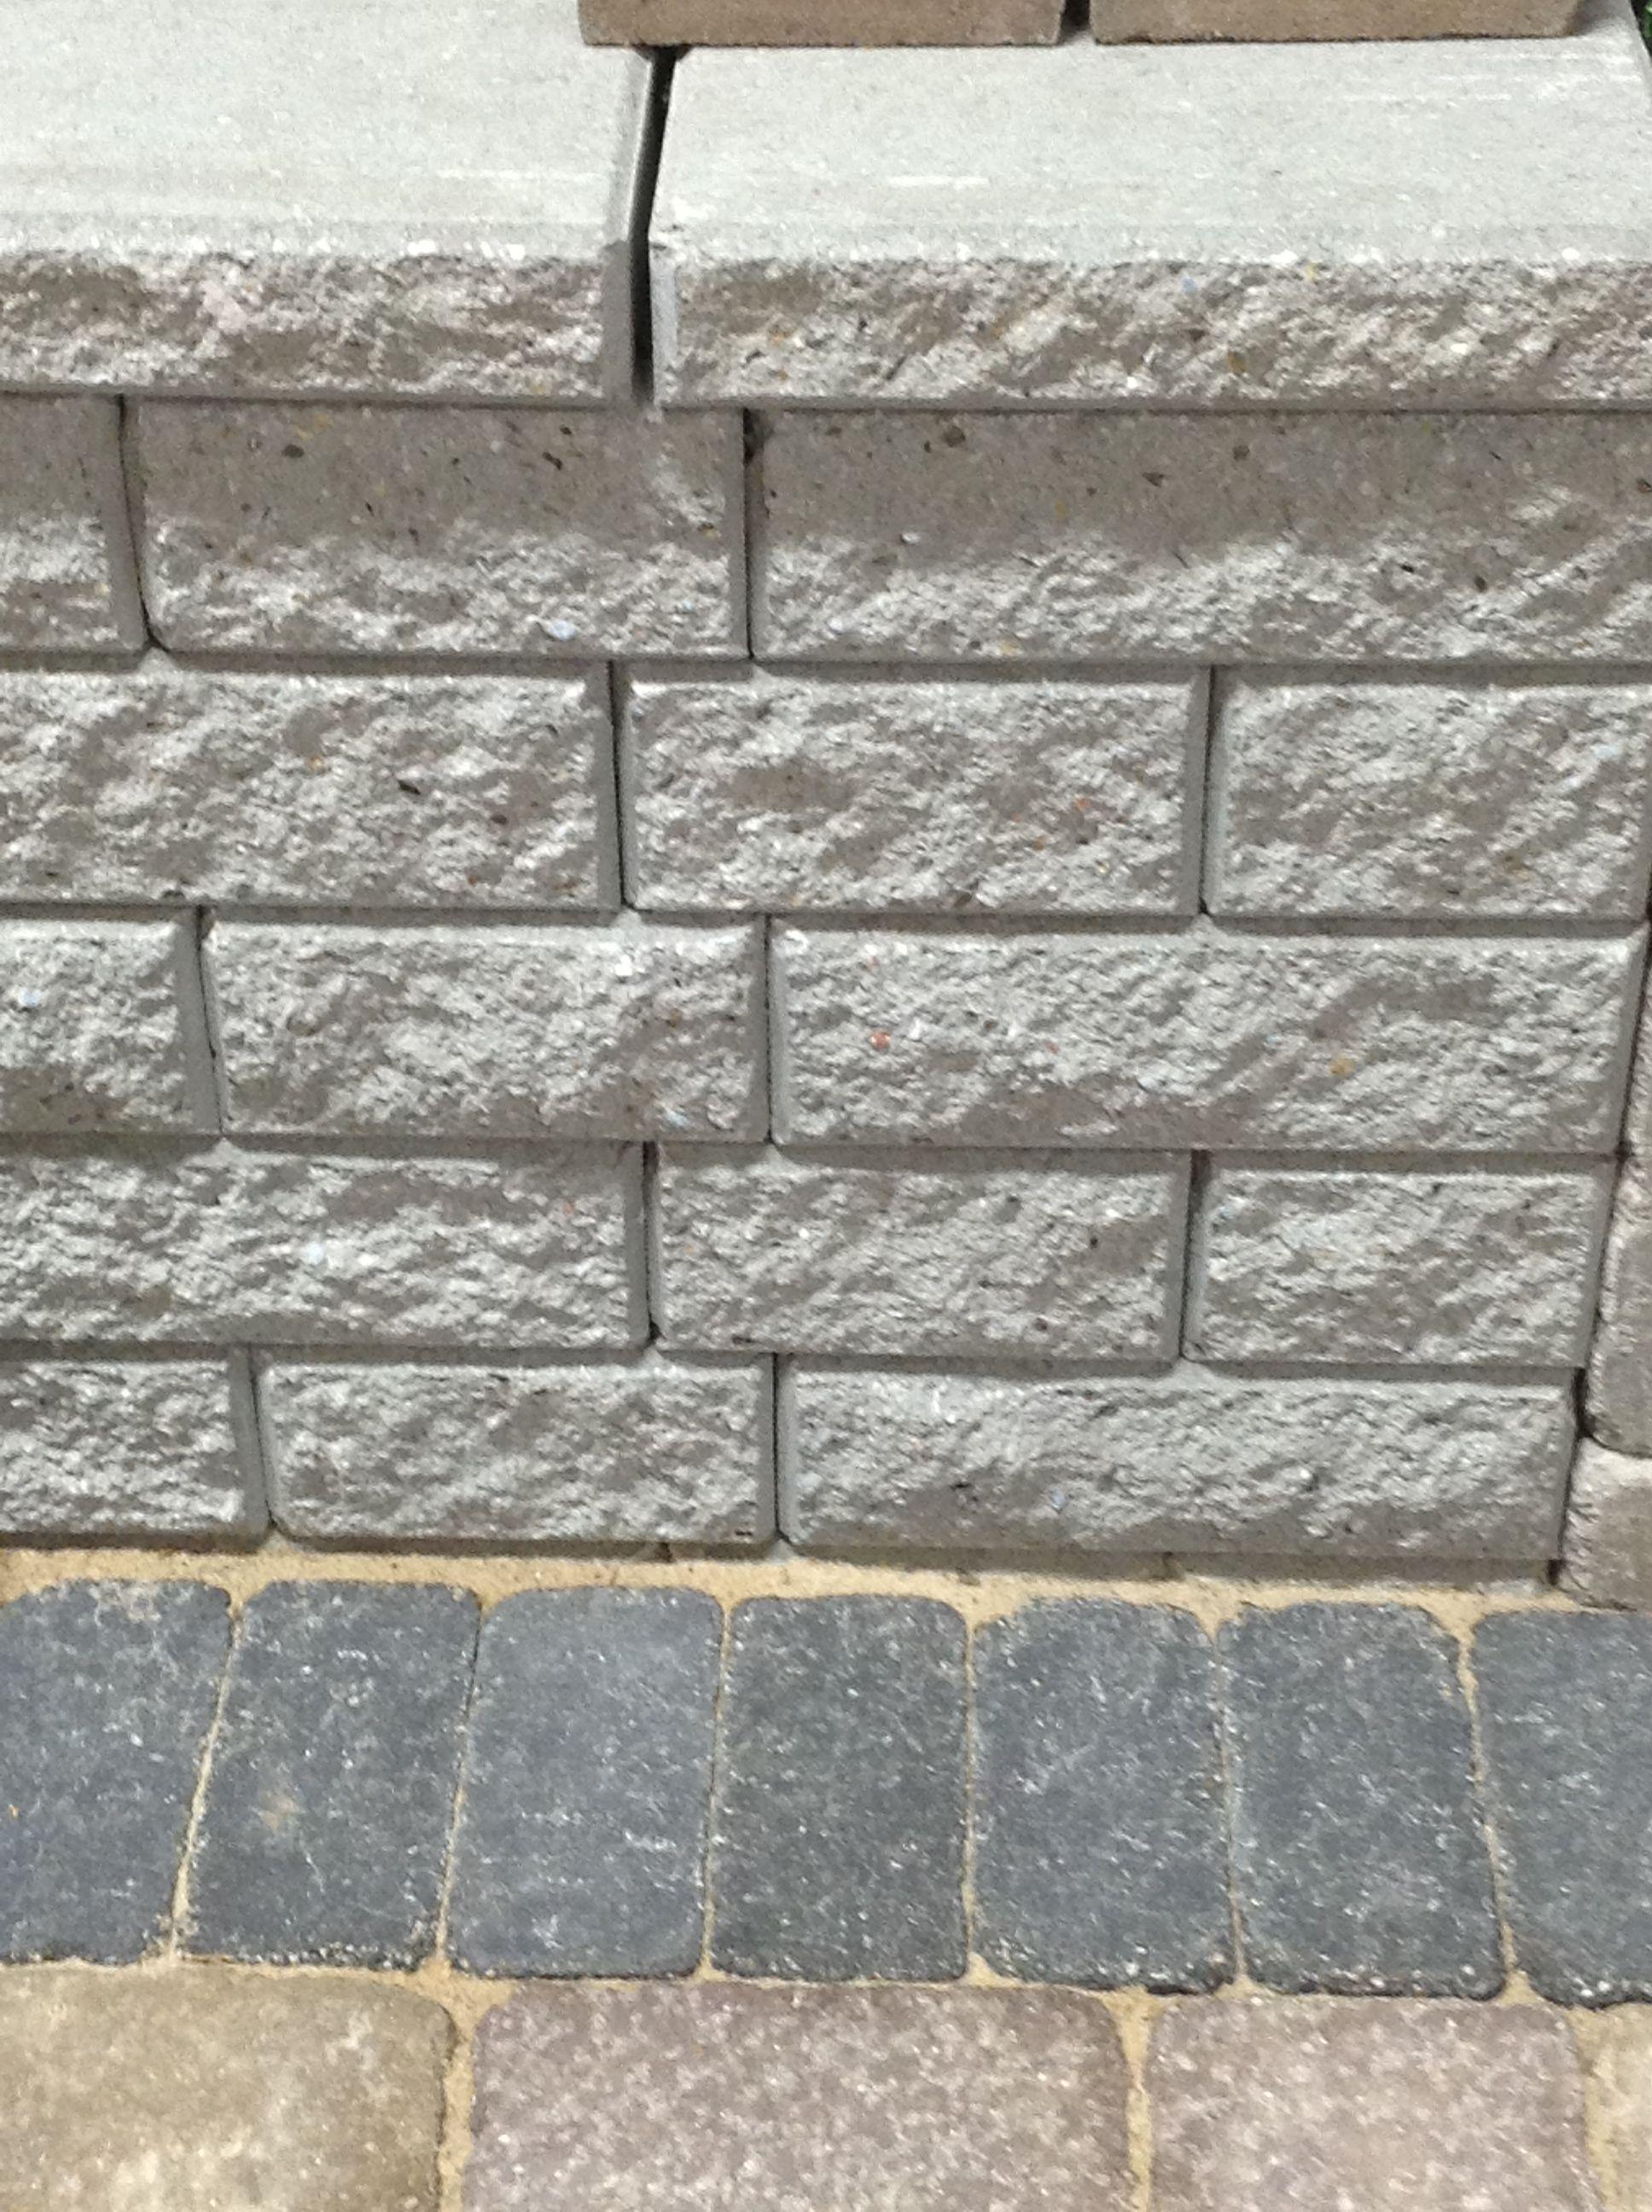 Best Way Stone Brick Retaining Wall Garden Lock Collection In Grey Outdoor Improvements Retaining Wall Backyard Design